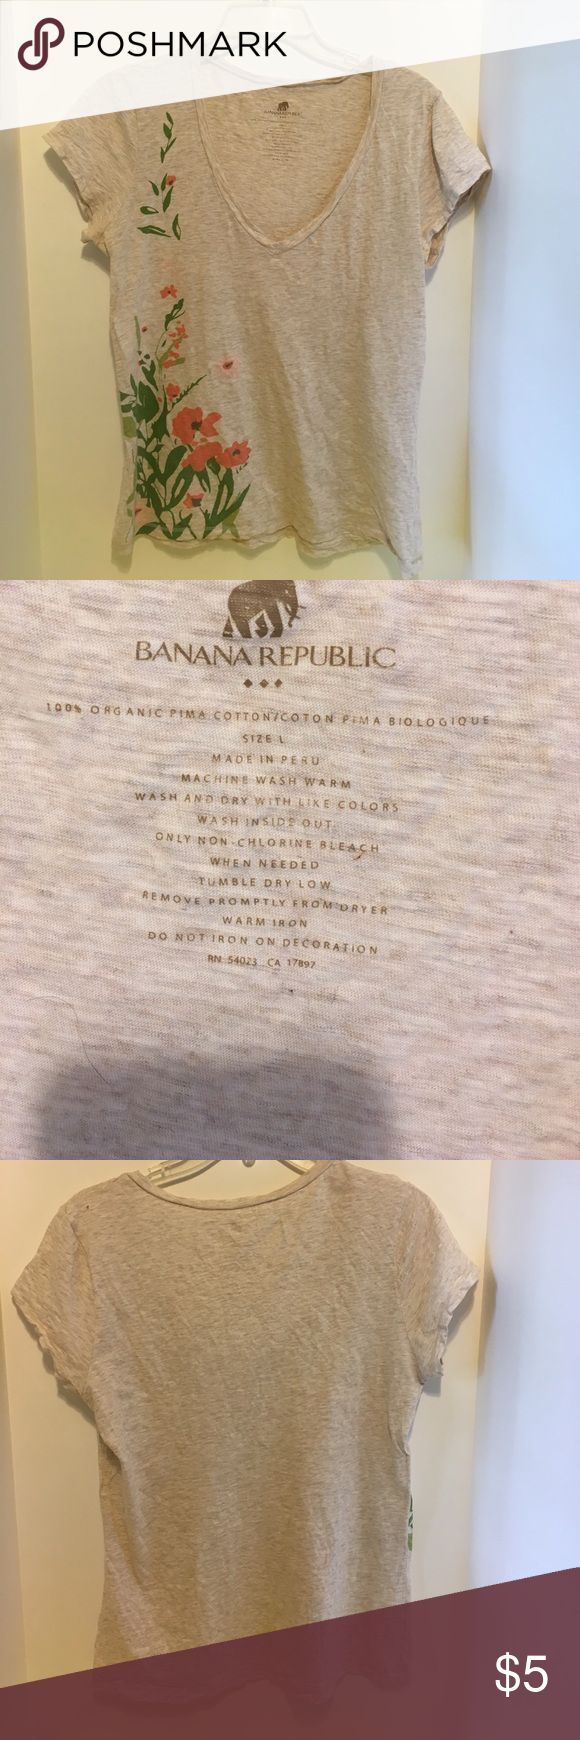 Banana Republic beige tee Banana Republic beige tee organic cotton with orange flowers. Small hole on back left shoulder Banana Republic Tops Tees - Short Sleeve